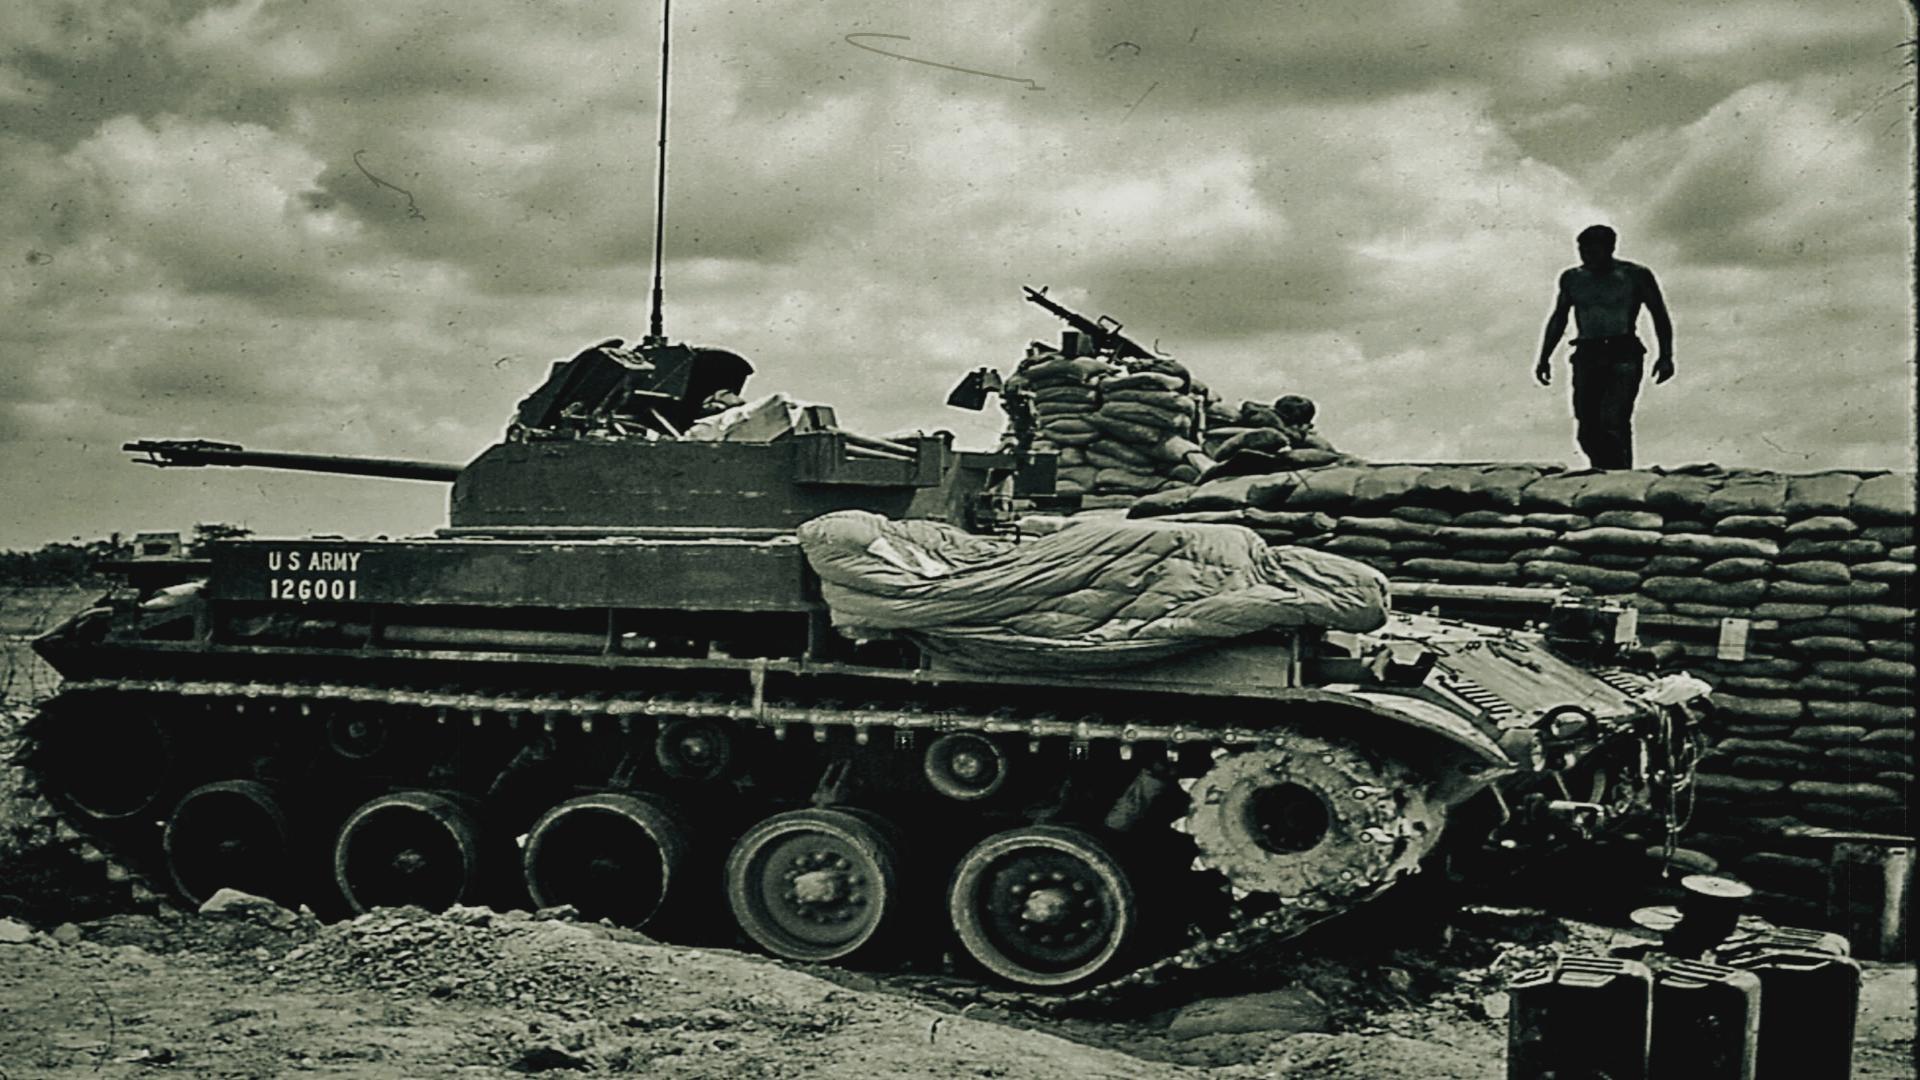 Photo 2 Vietnam_Aftermath_204__Smaller_File.jpg